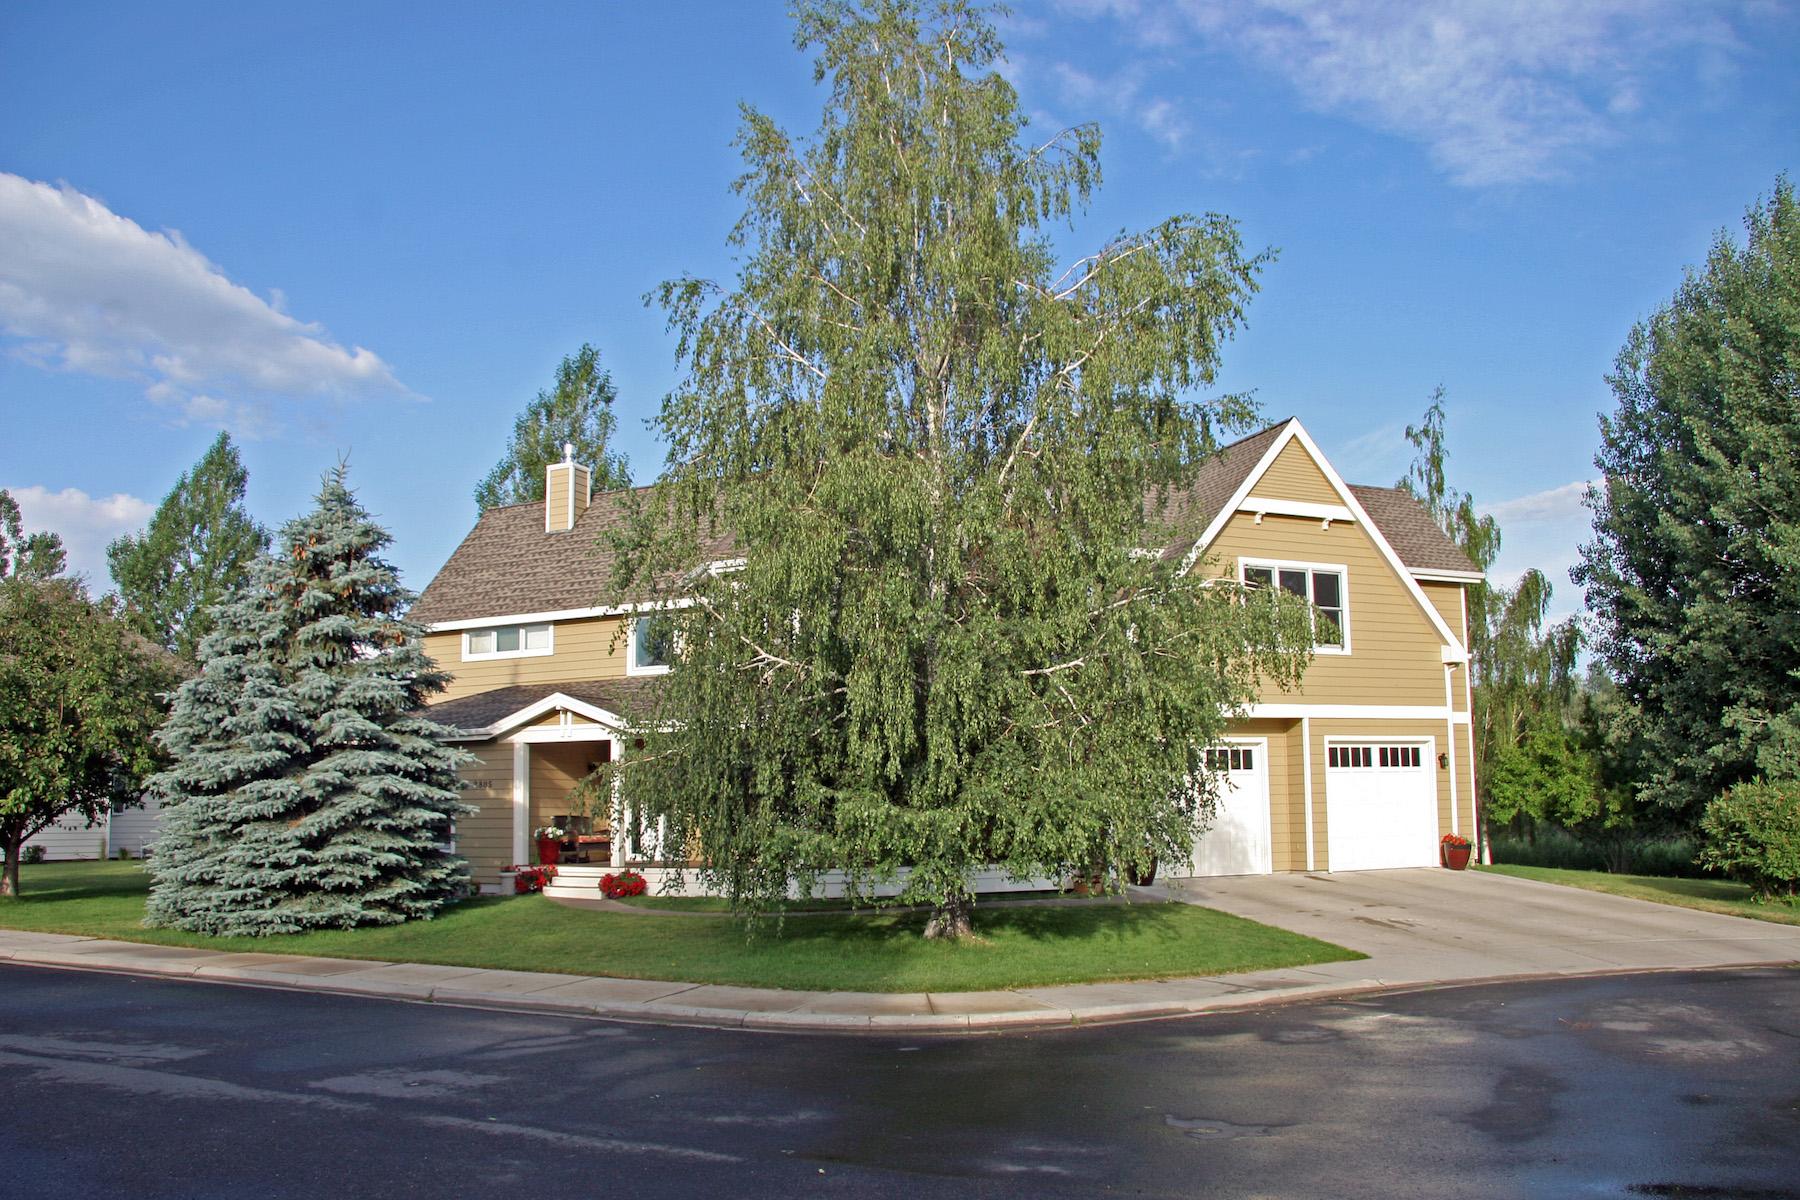 Villa per Vendita alle ore 2805 Spring Meadows Dr. 2805 Spring Meadows Drive Bozeman, Montana 59715 Stati Uniti